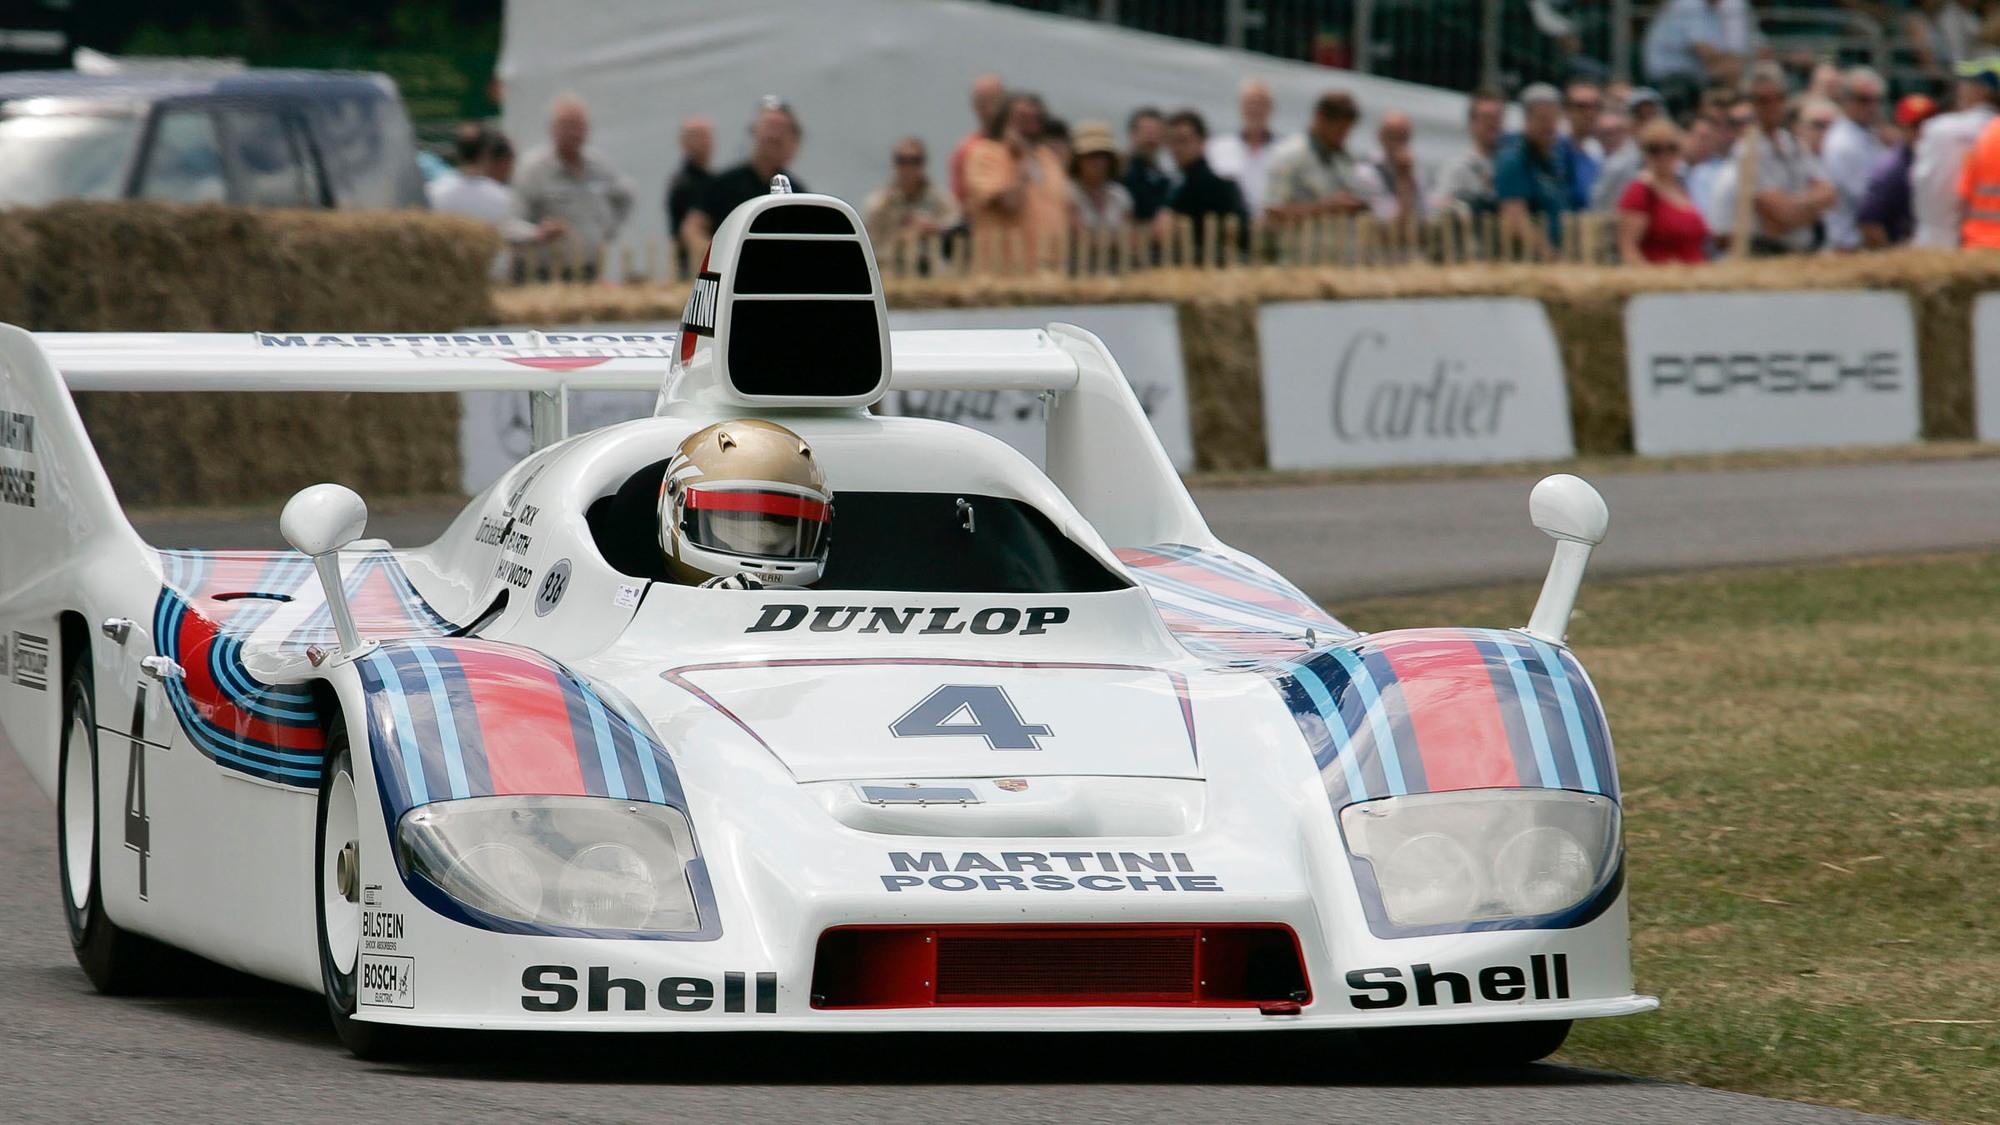 45 Years of Martini Racing History